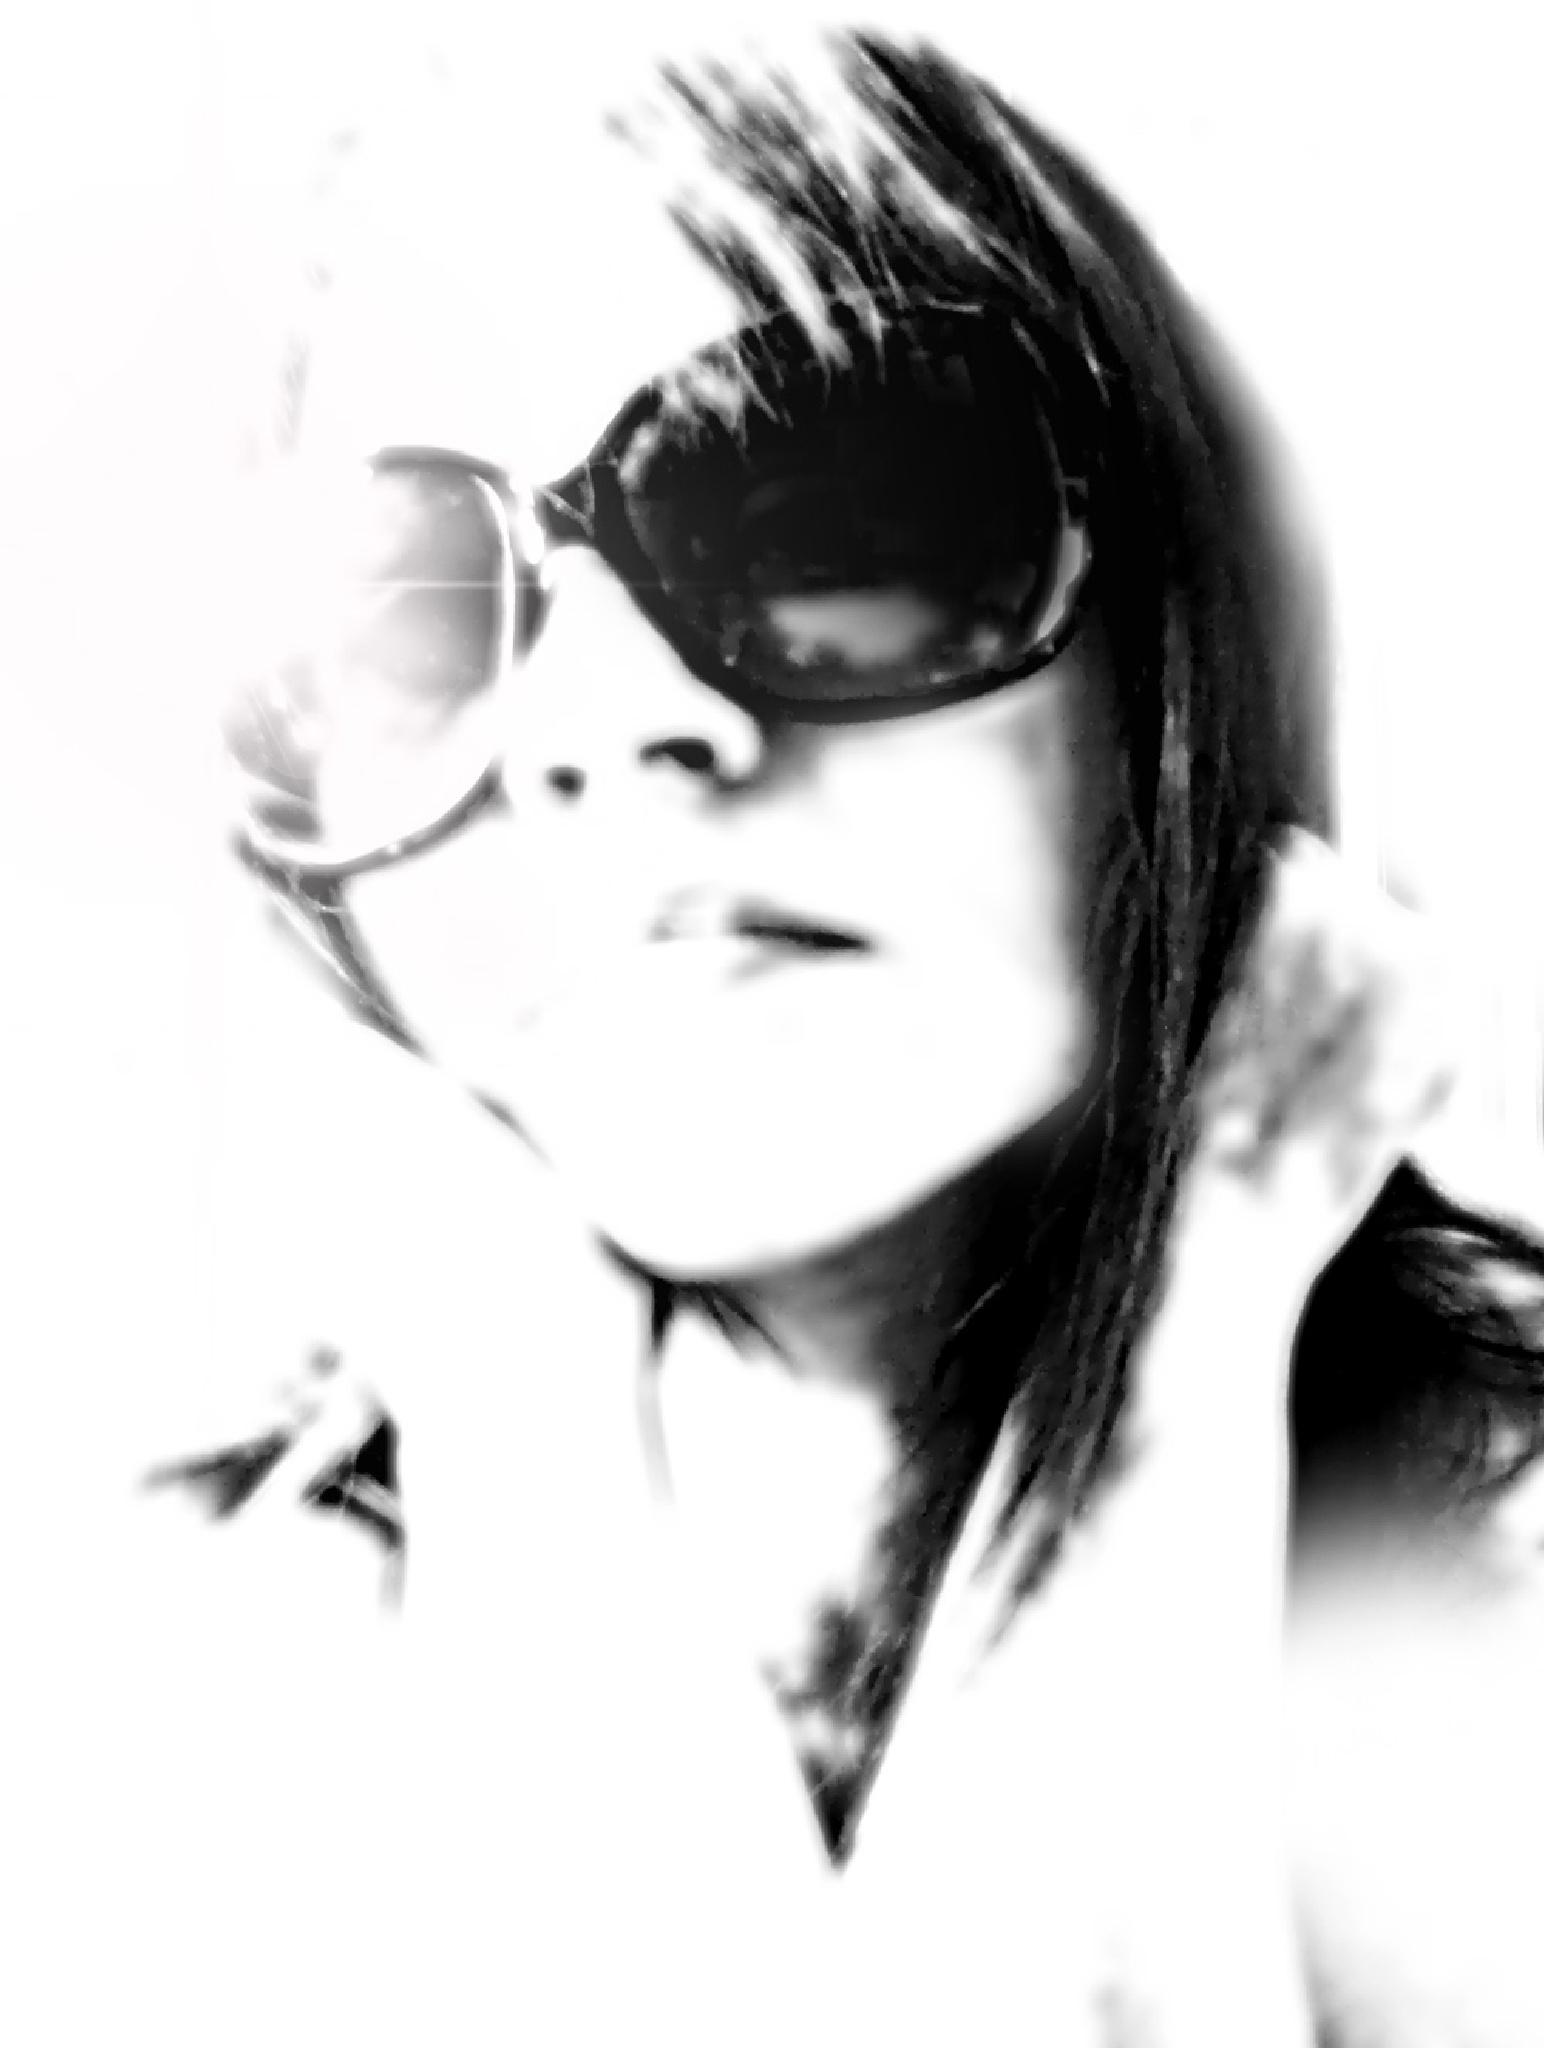 Self by Celina del Castillo